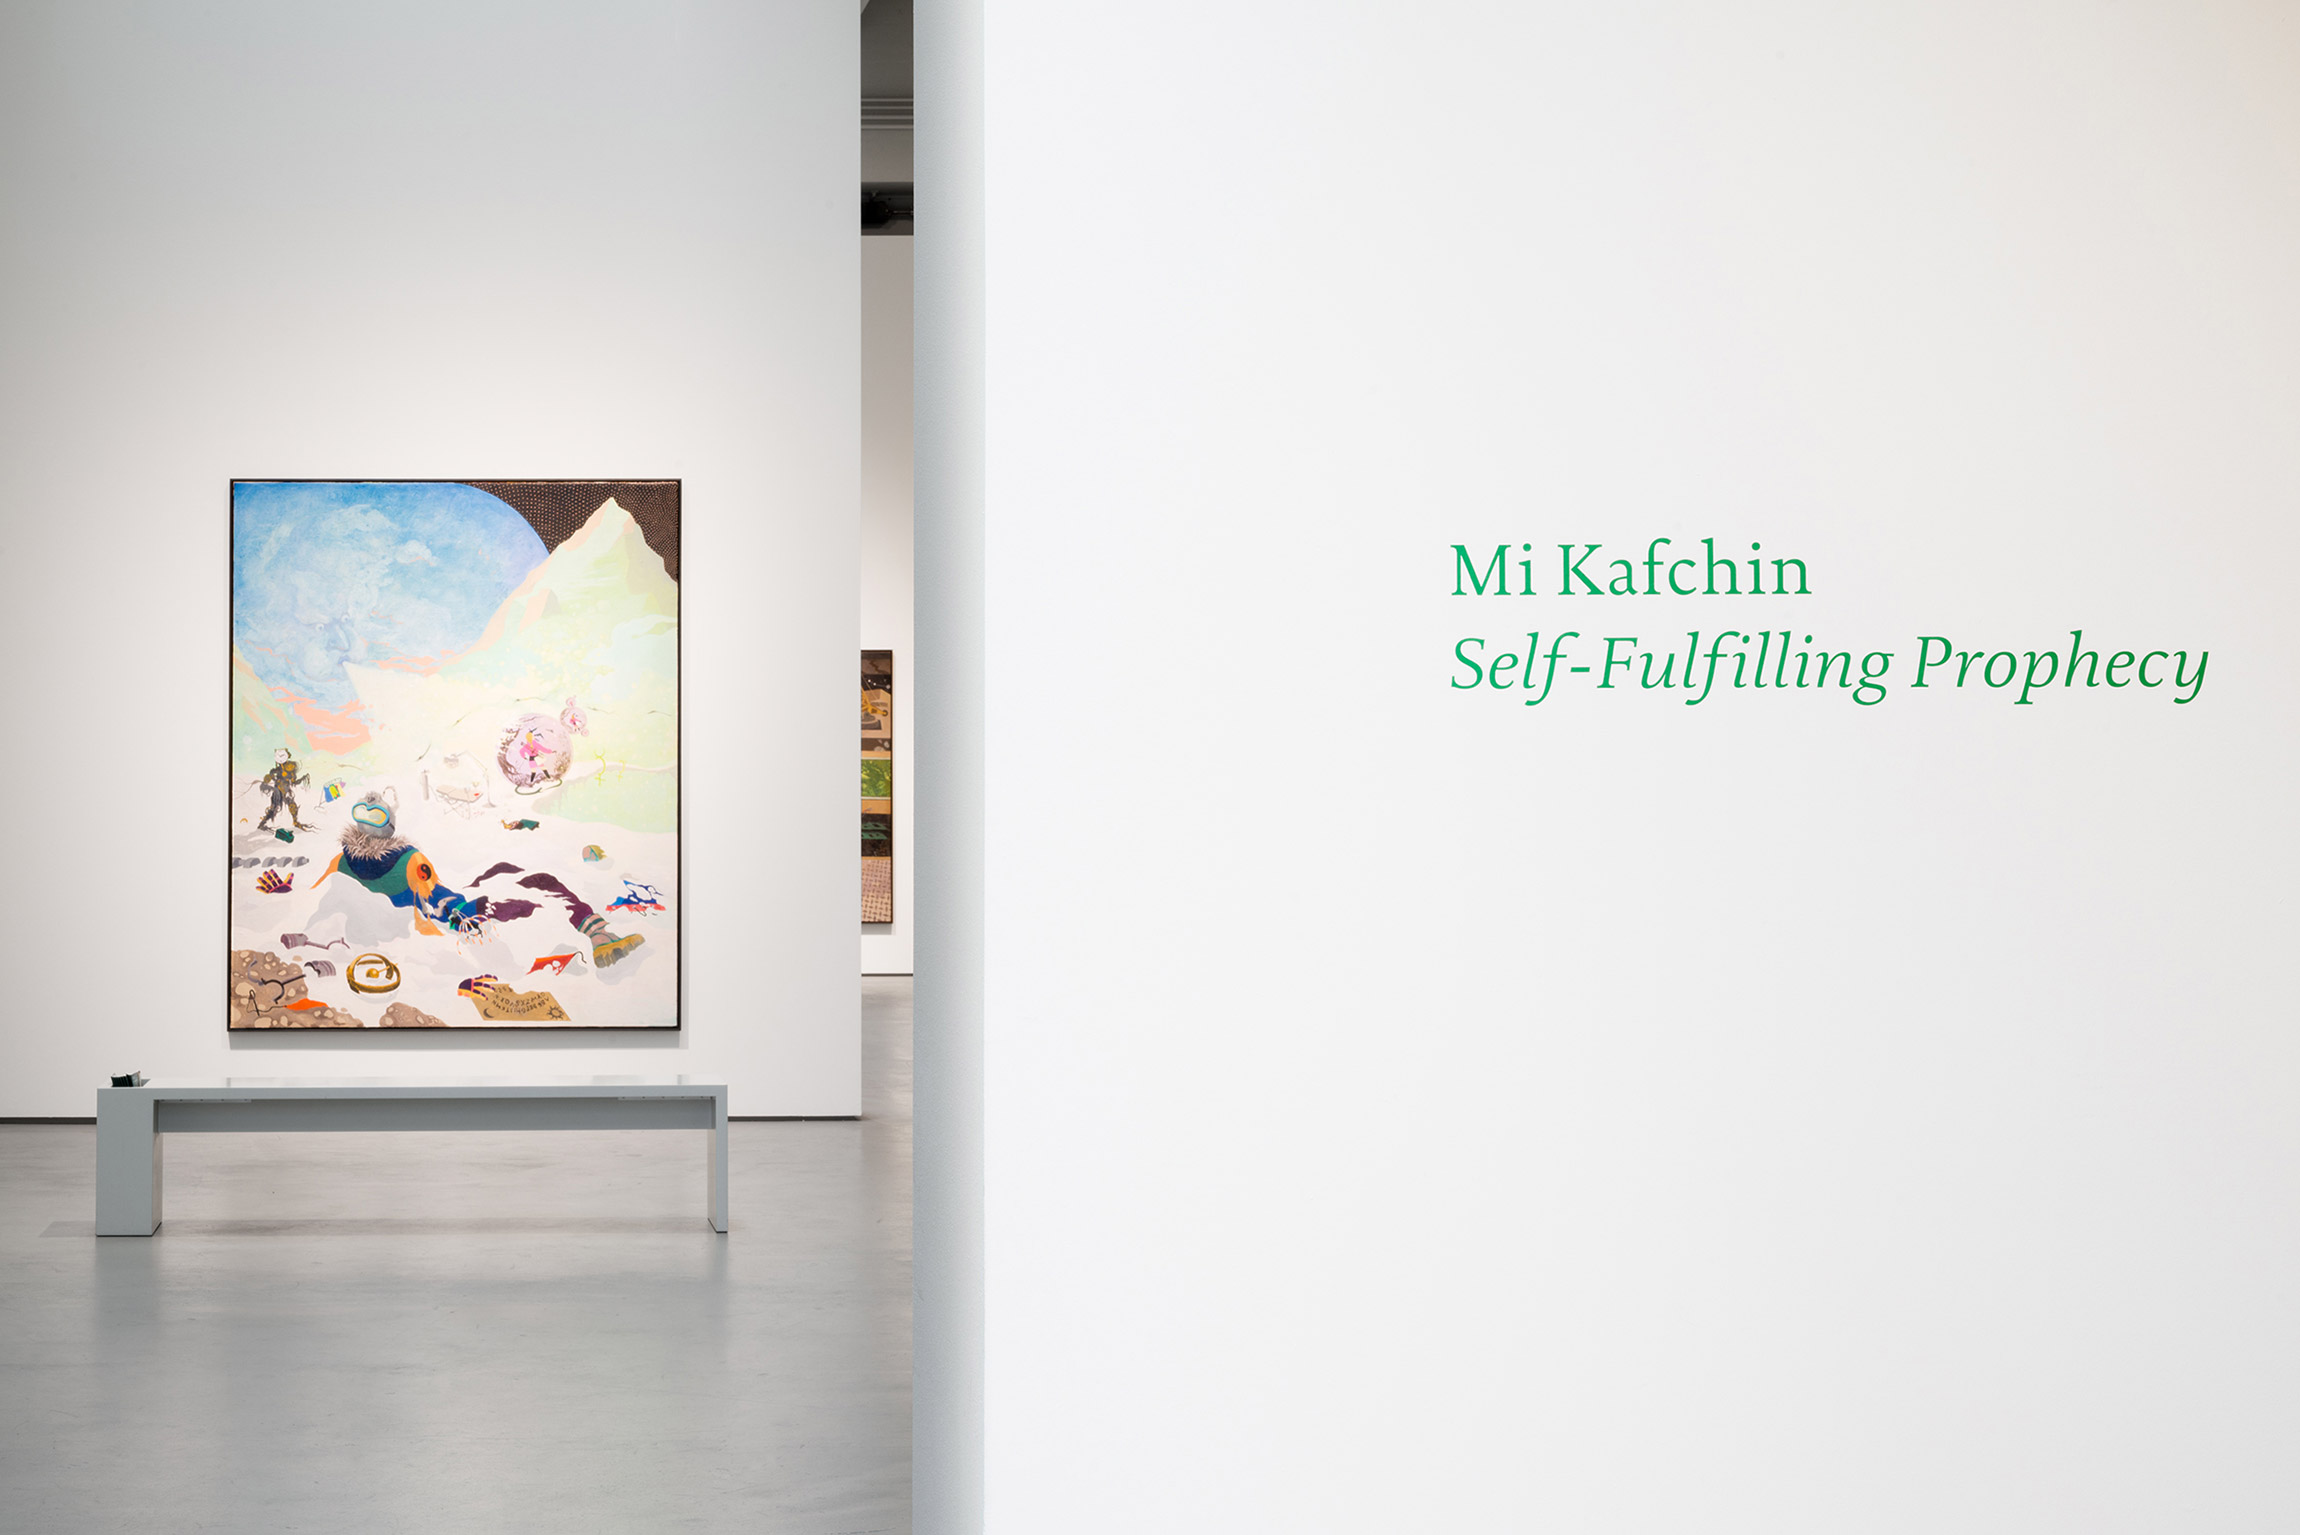 2016 Mi Kafchin Self-Fulfilling Prophecy